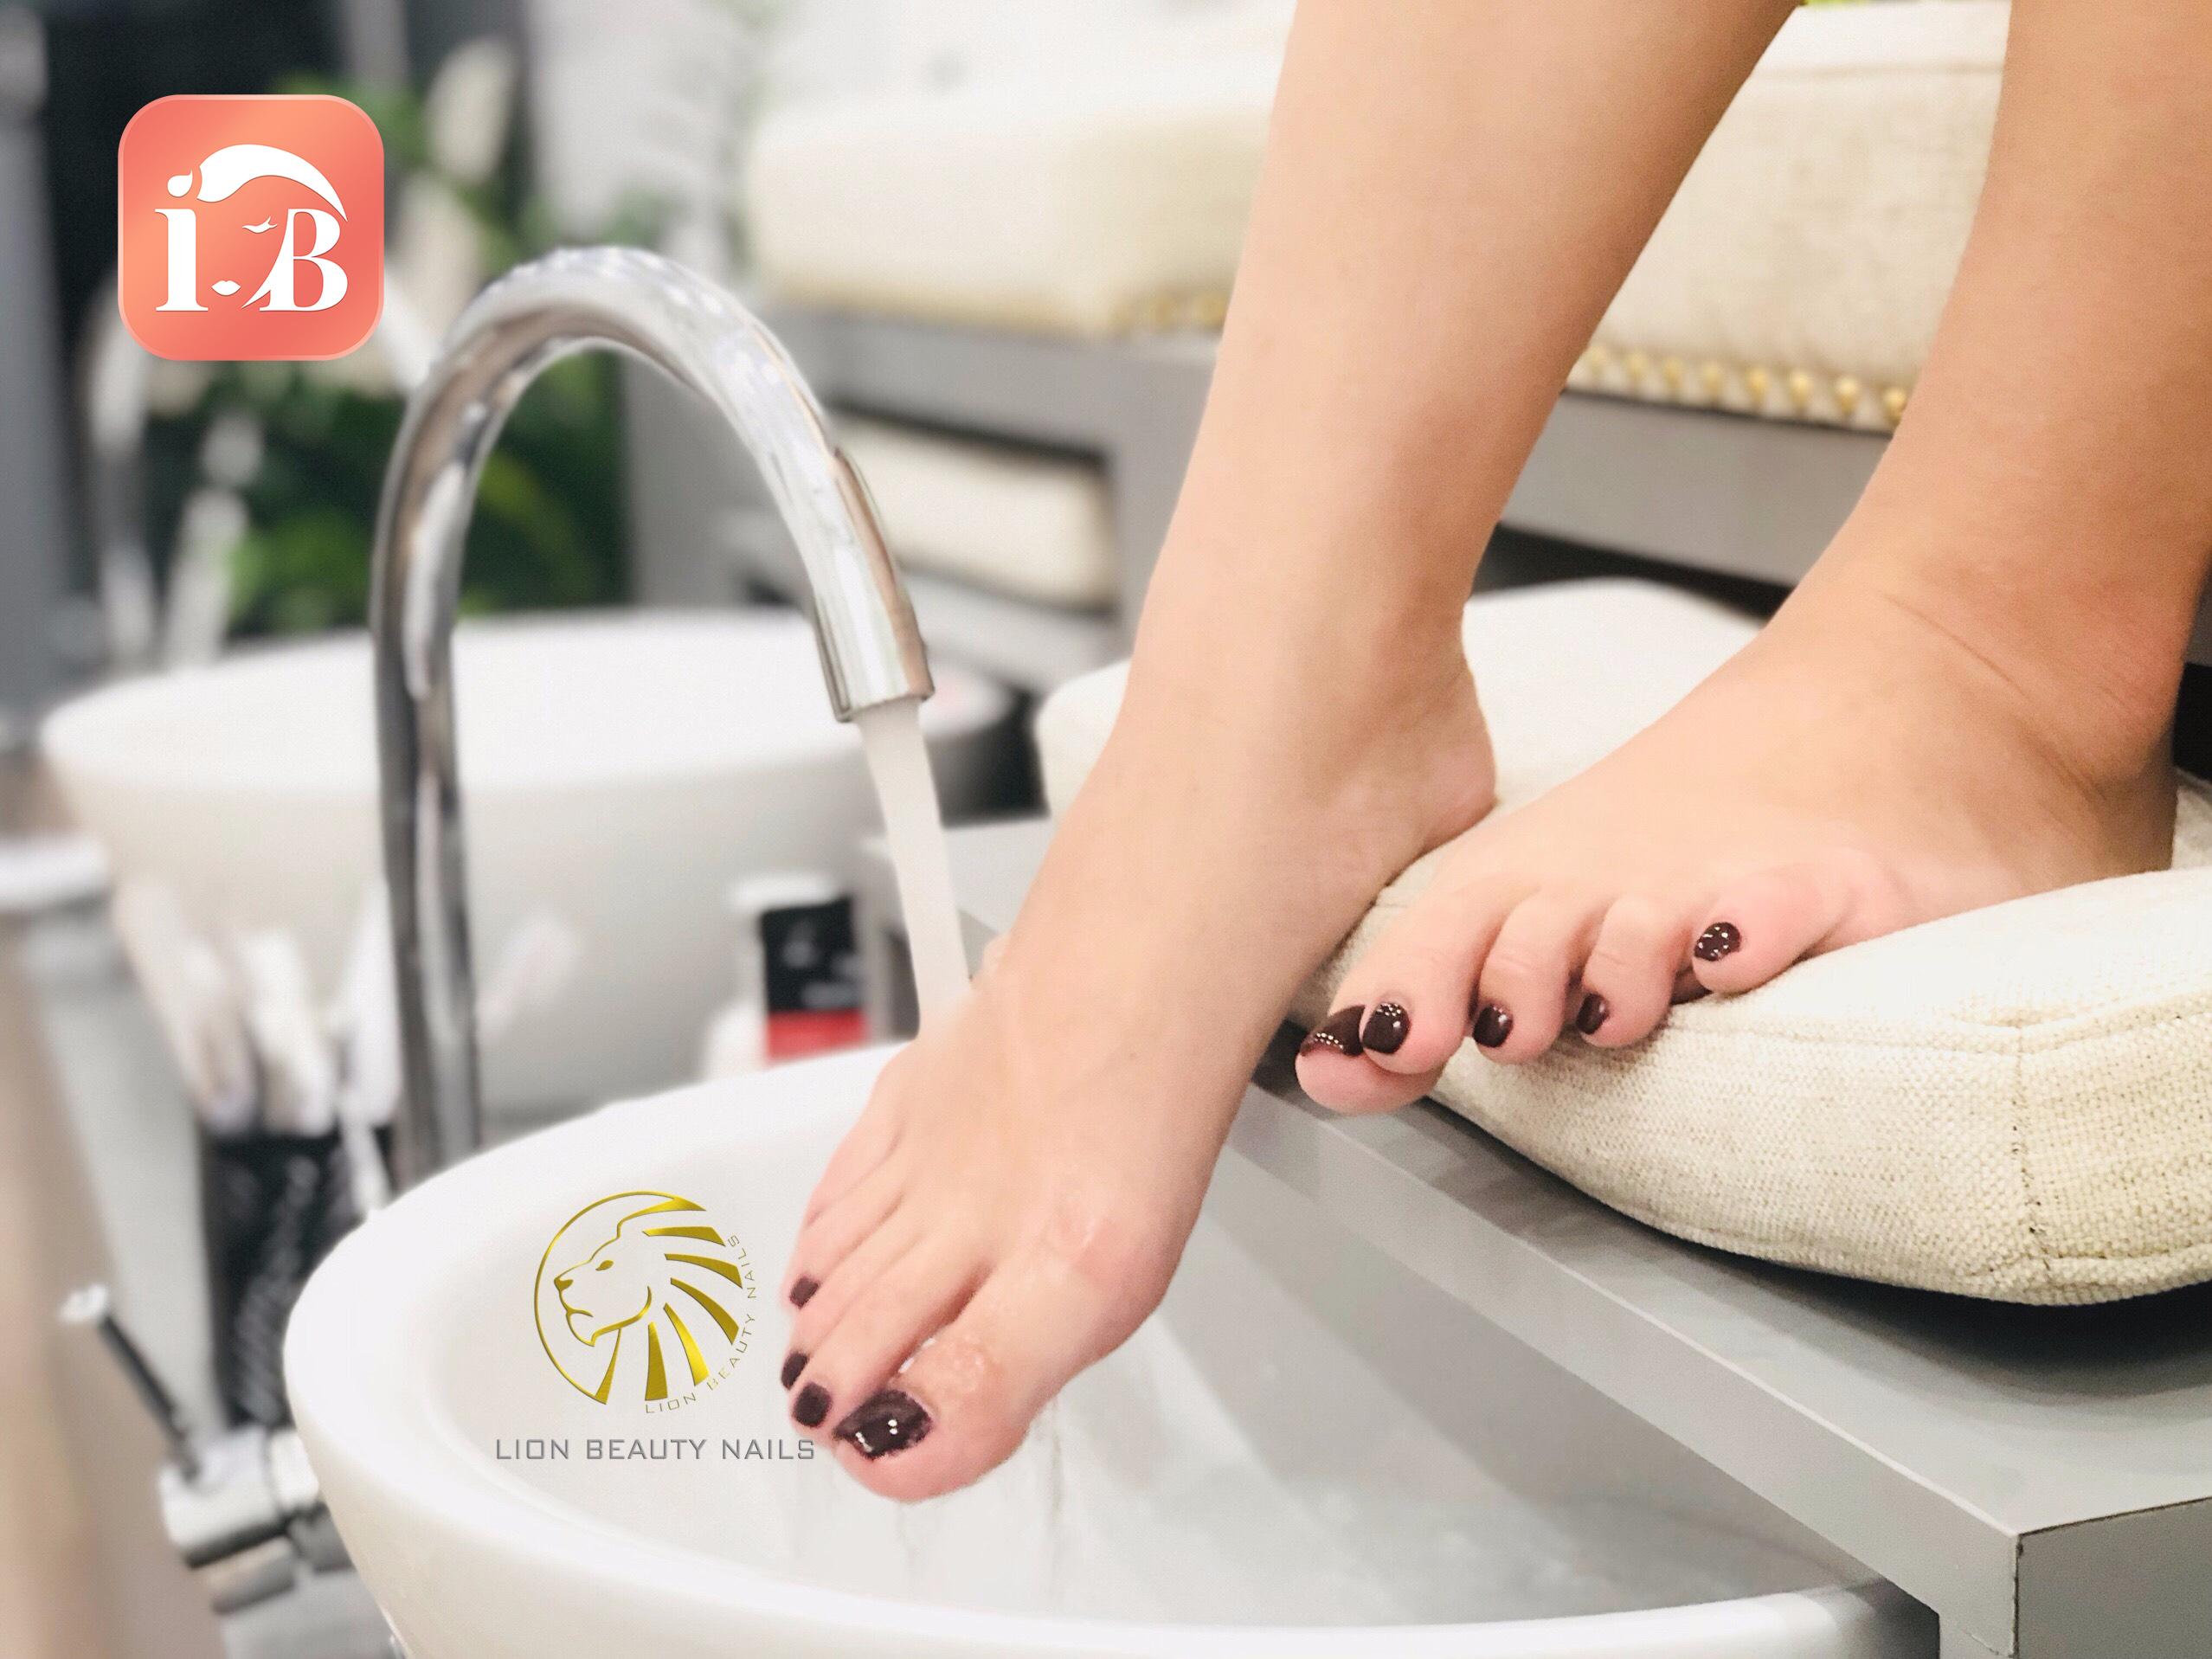 Giảm 10% dịch vụ massage chân CND